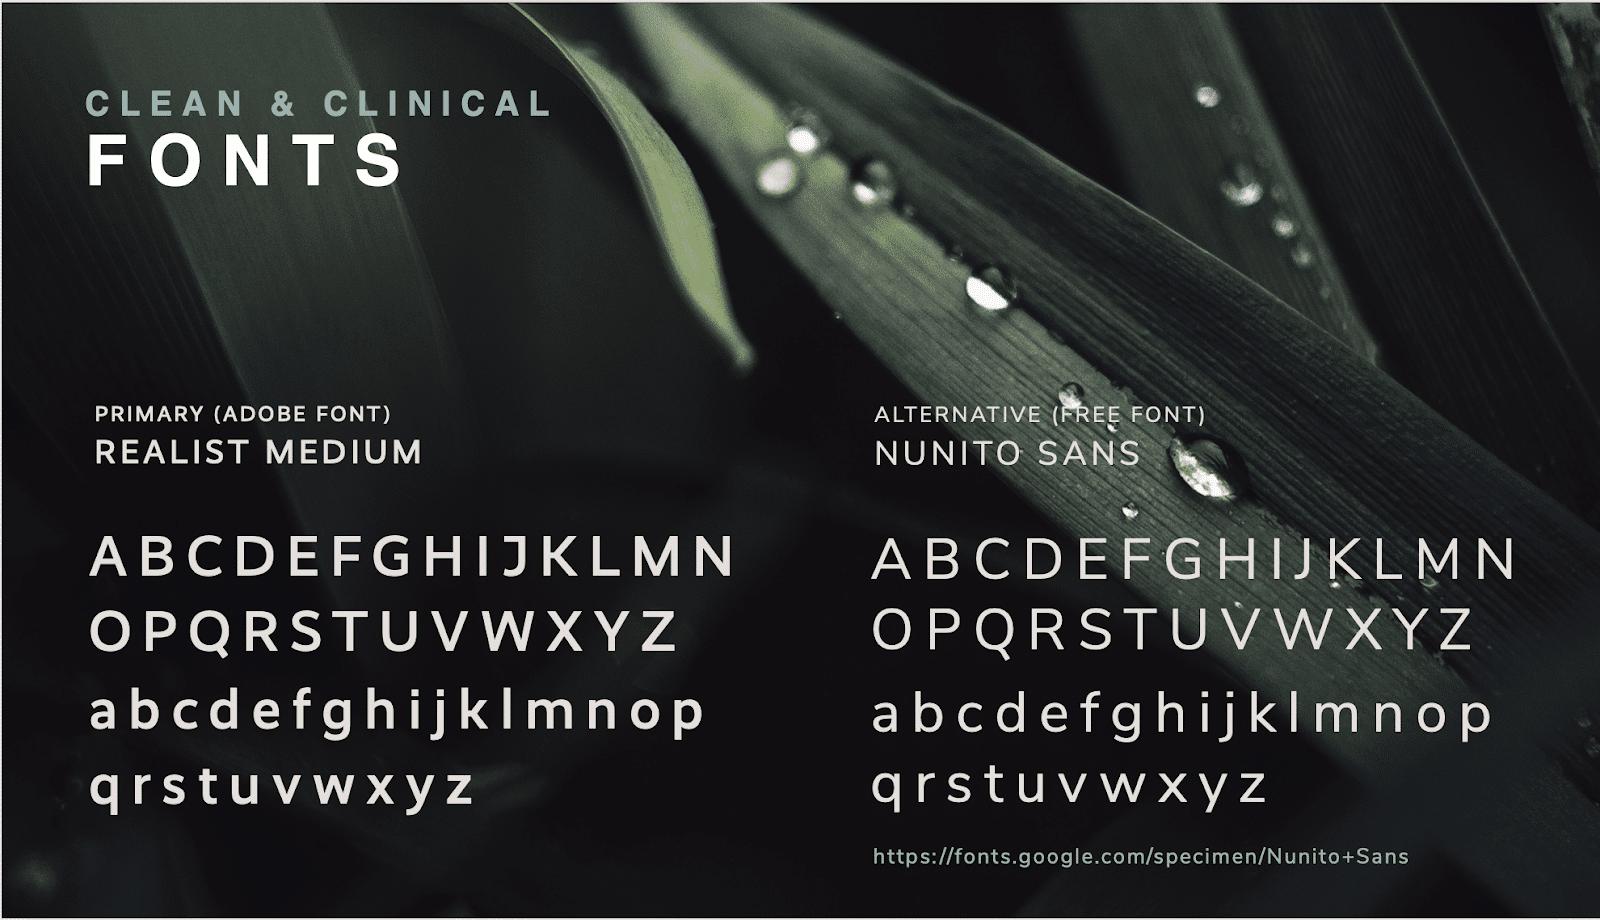 Alkaline Herb Shop brand presentation showcasing sleek and clean typography.